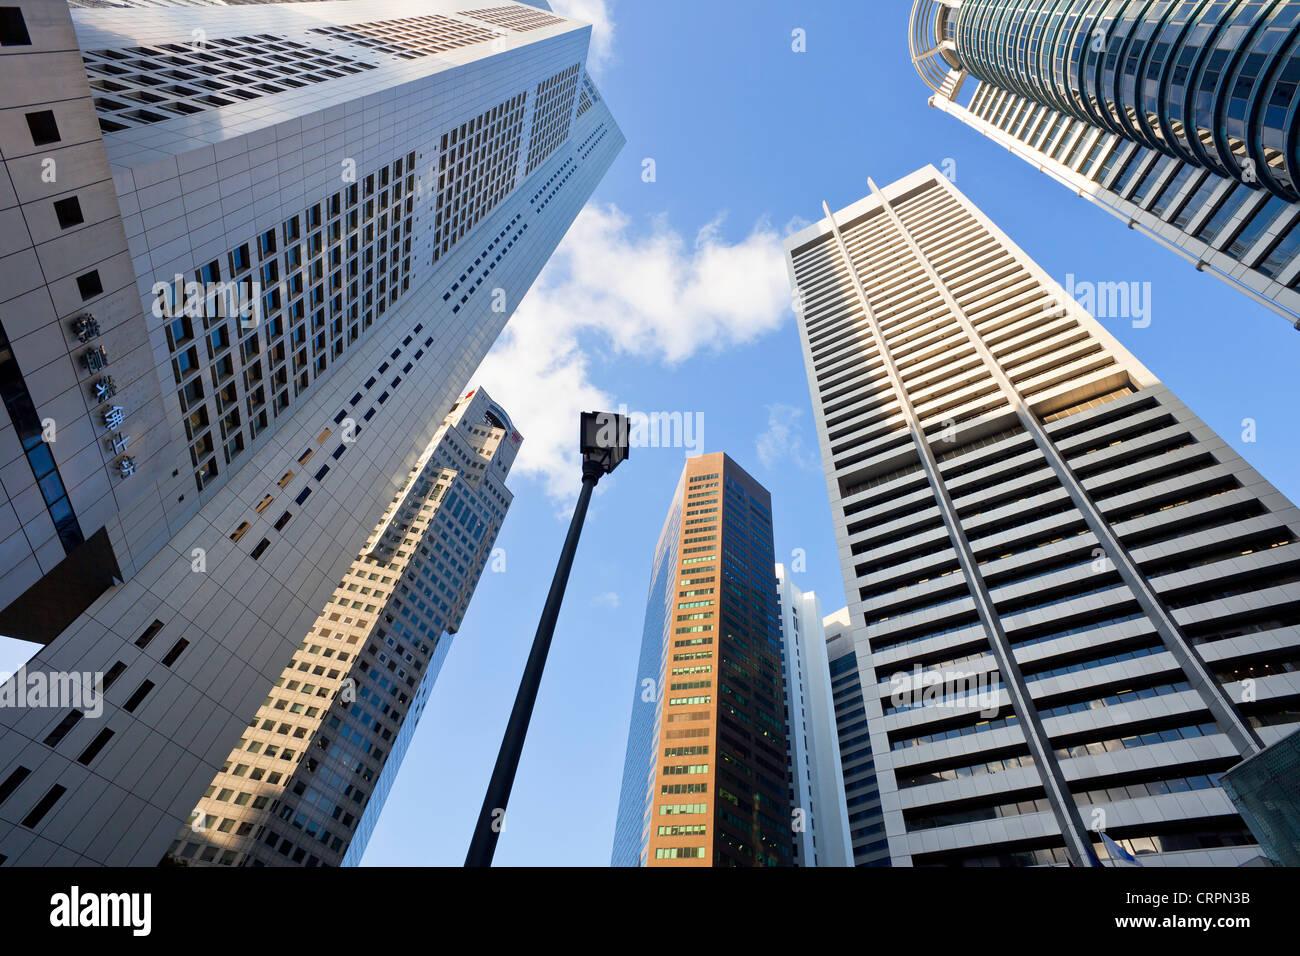 South East Asia, Singapore, CBD, Financial Centre Office Buildings - Stock Image